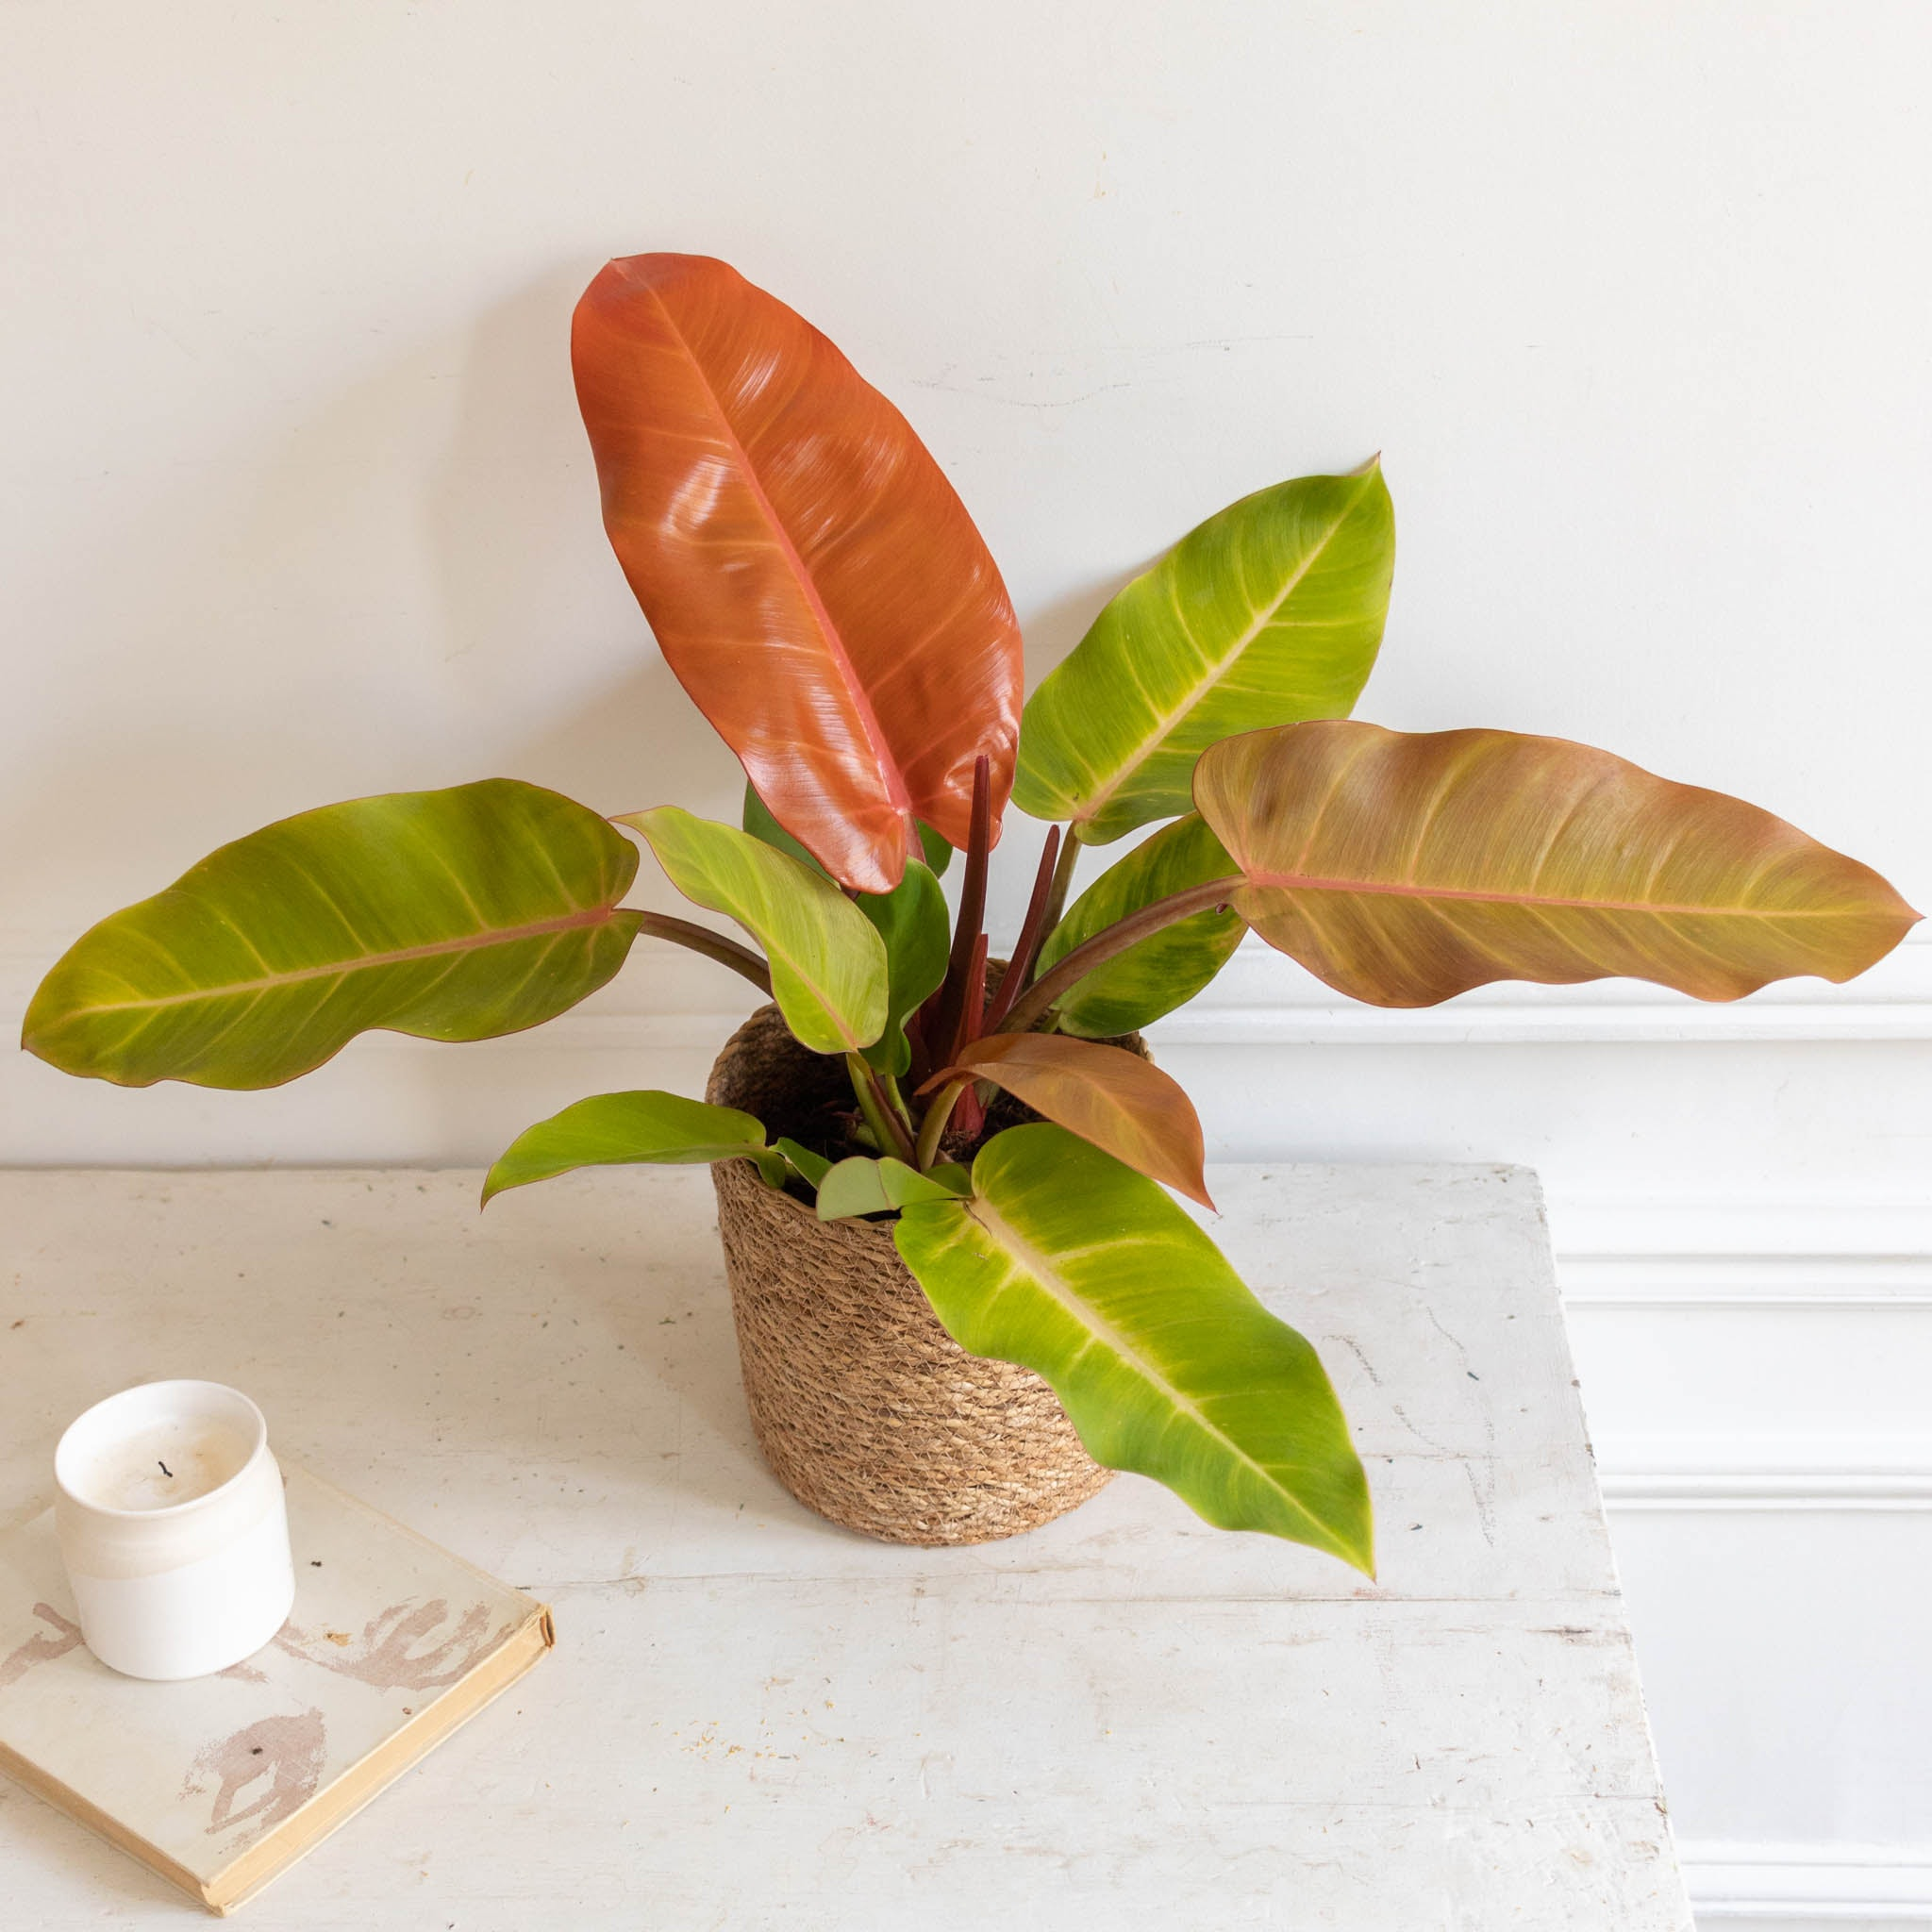 Prince et son cache-pot - Philodendron 'Prince of Orange'